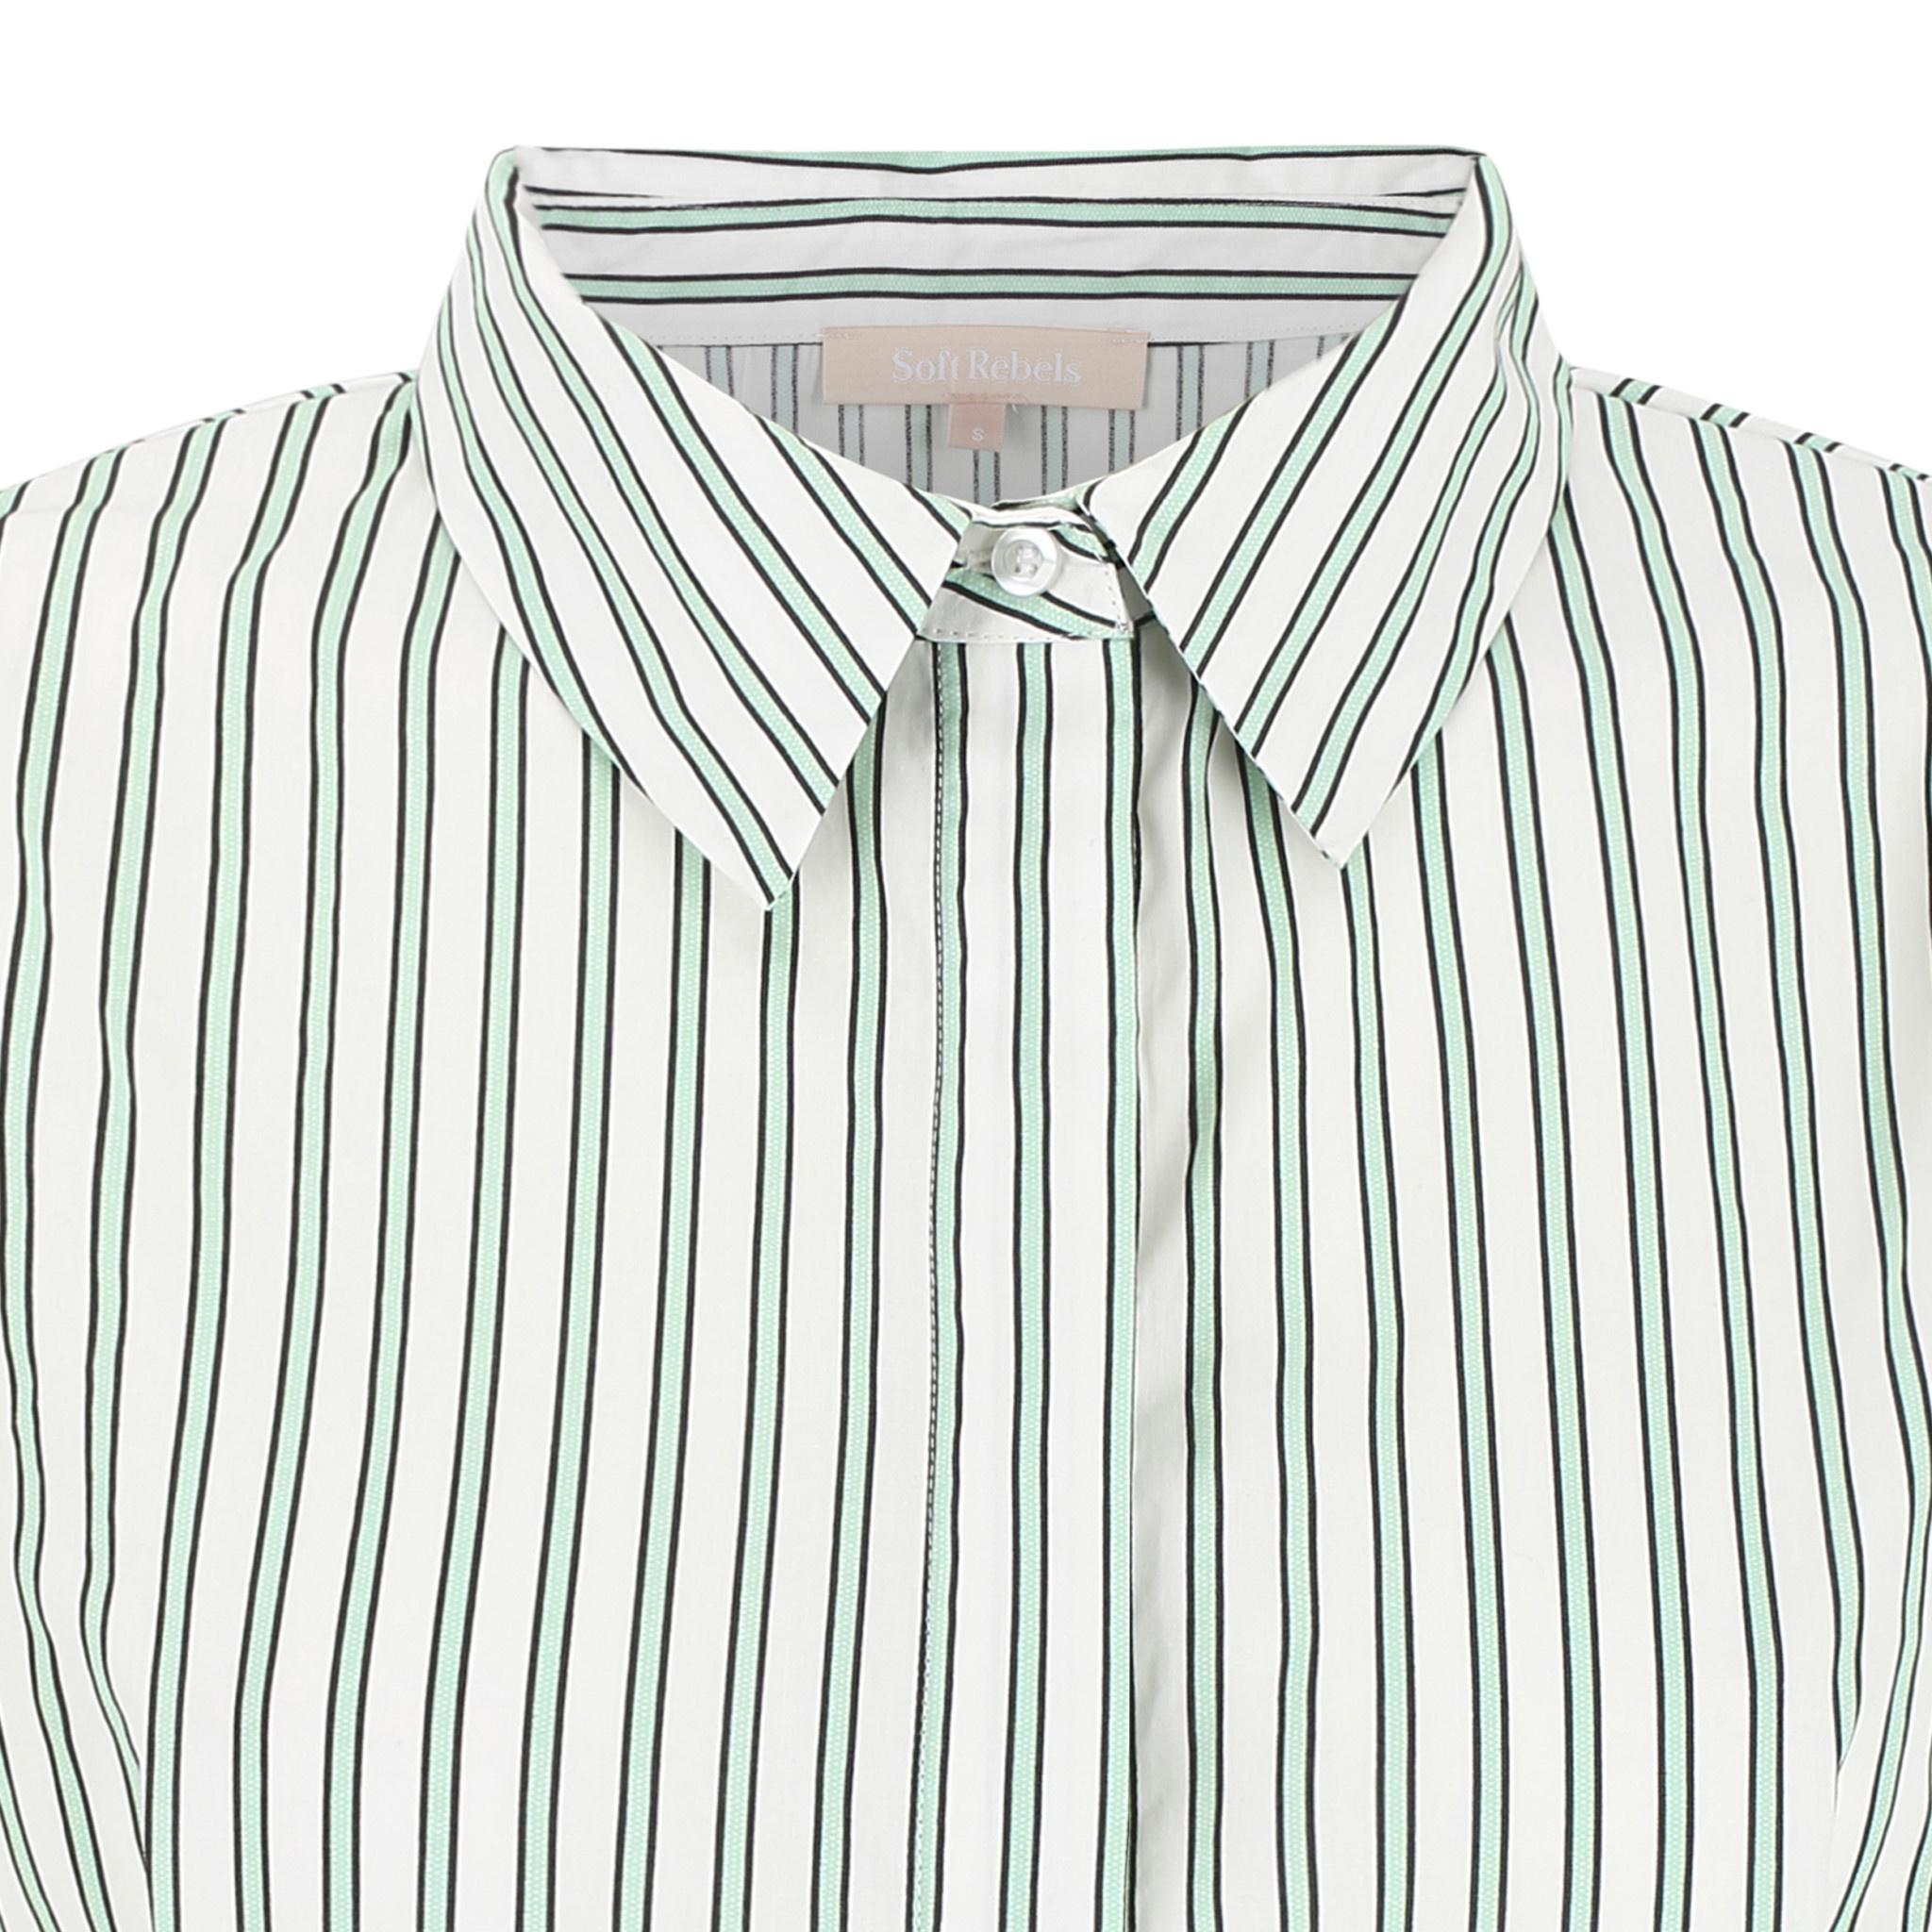 Soft Rebels Bobbi LS Shirt